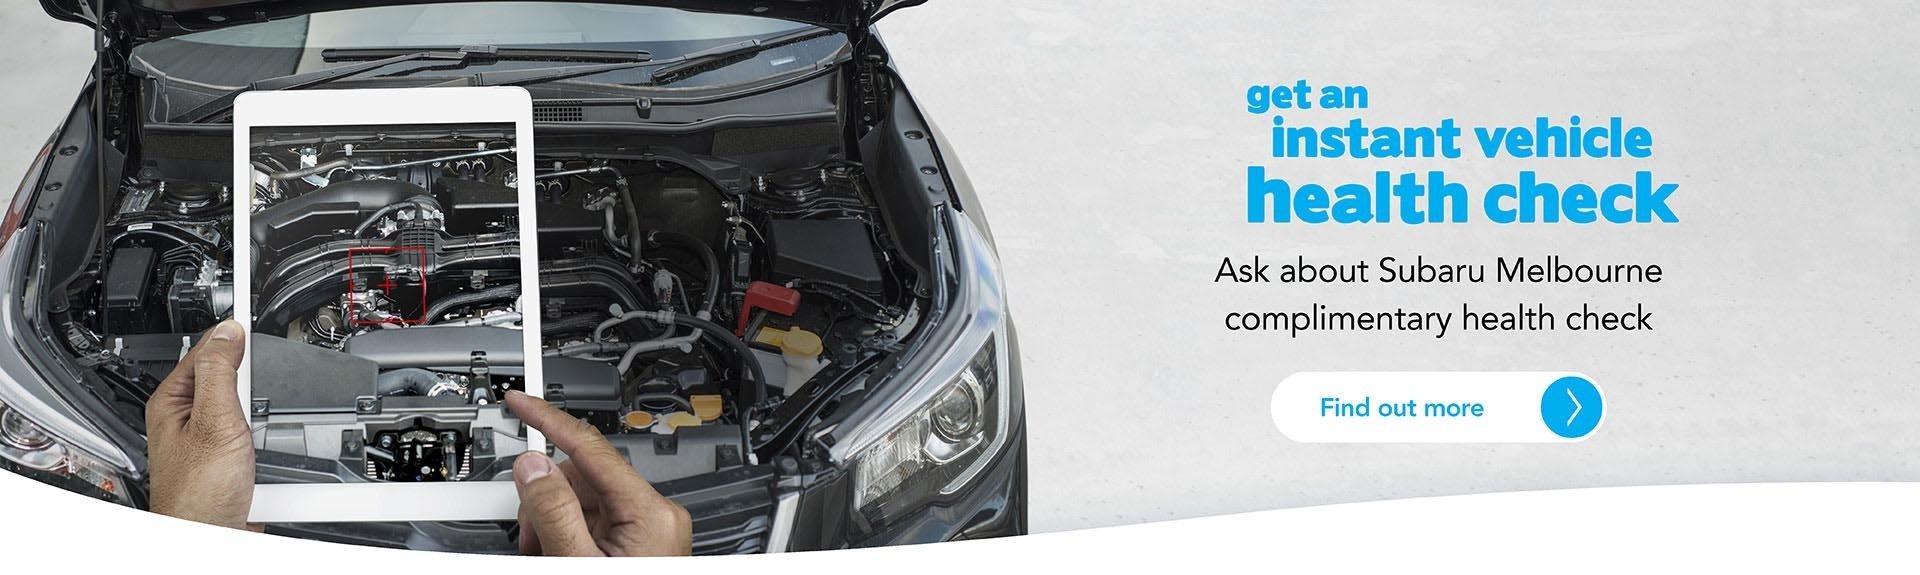 Subaru-EVHC